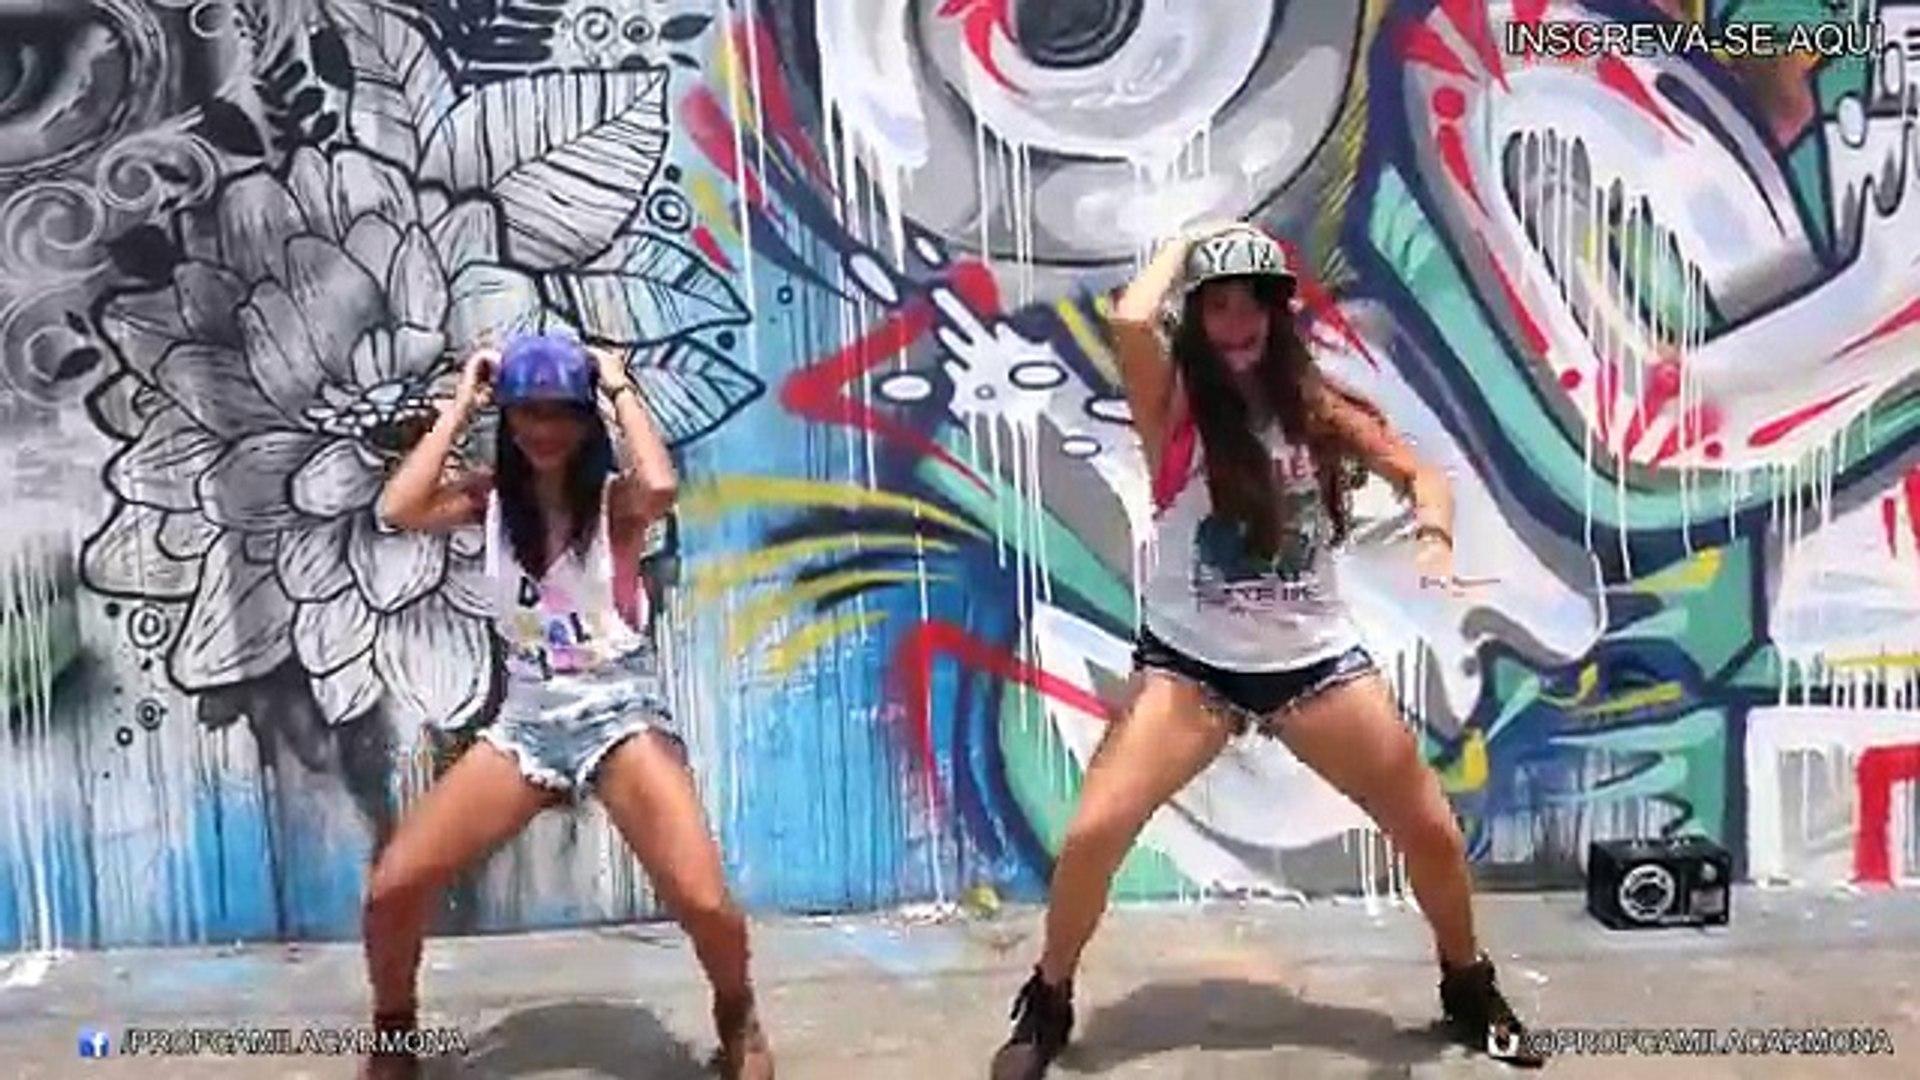 Mc 2k - Pra Todas As Meninas (Coreografia Camila Carmona)